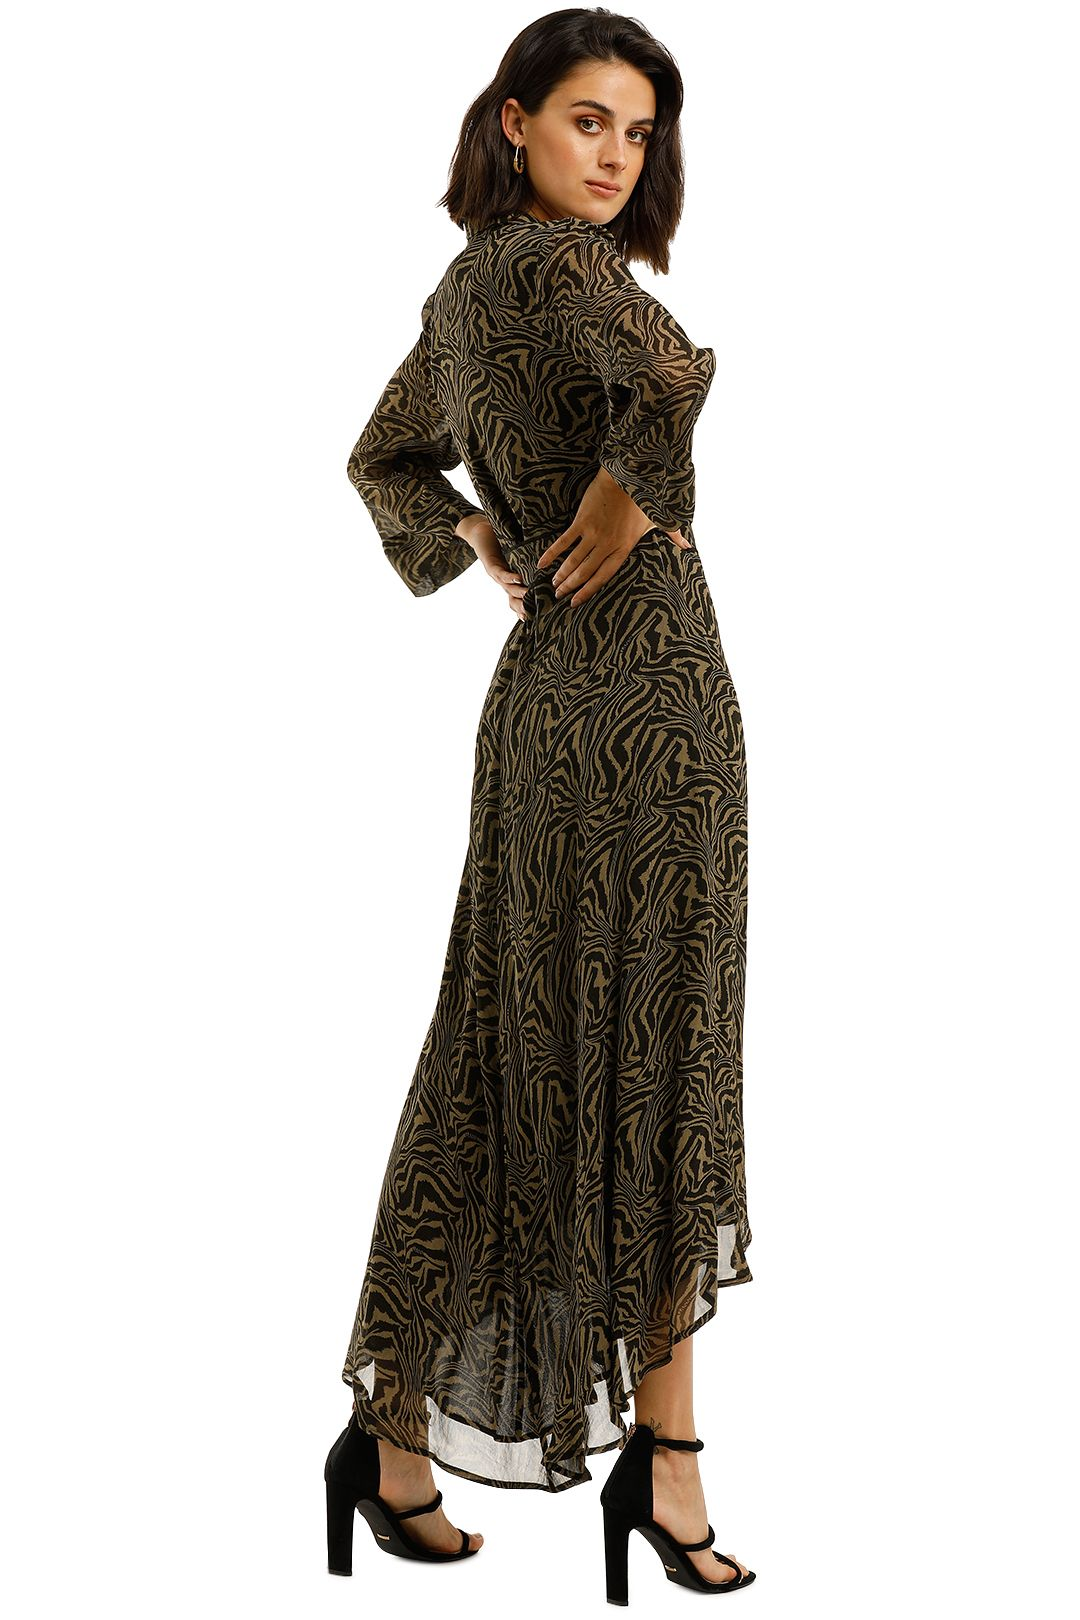 Ganni-Printed-Georgette-LS-Long-Wrap-Dress-Kalamata-Back